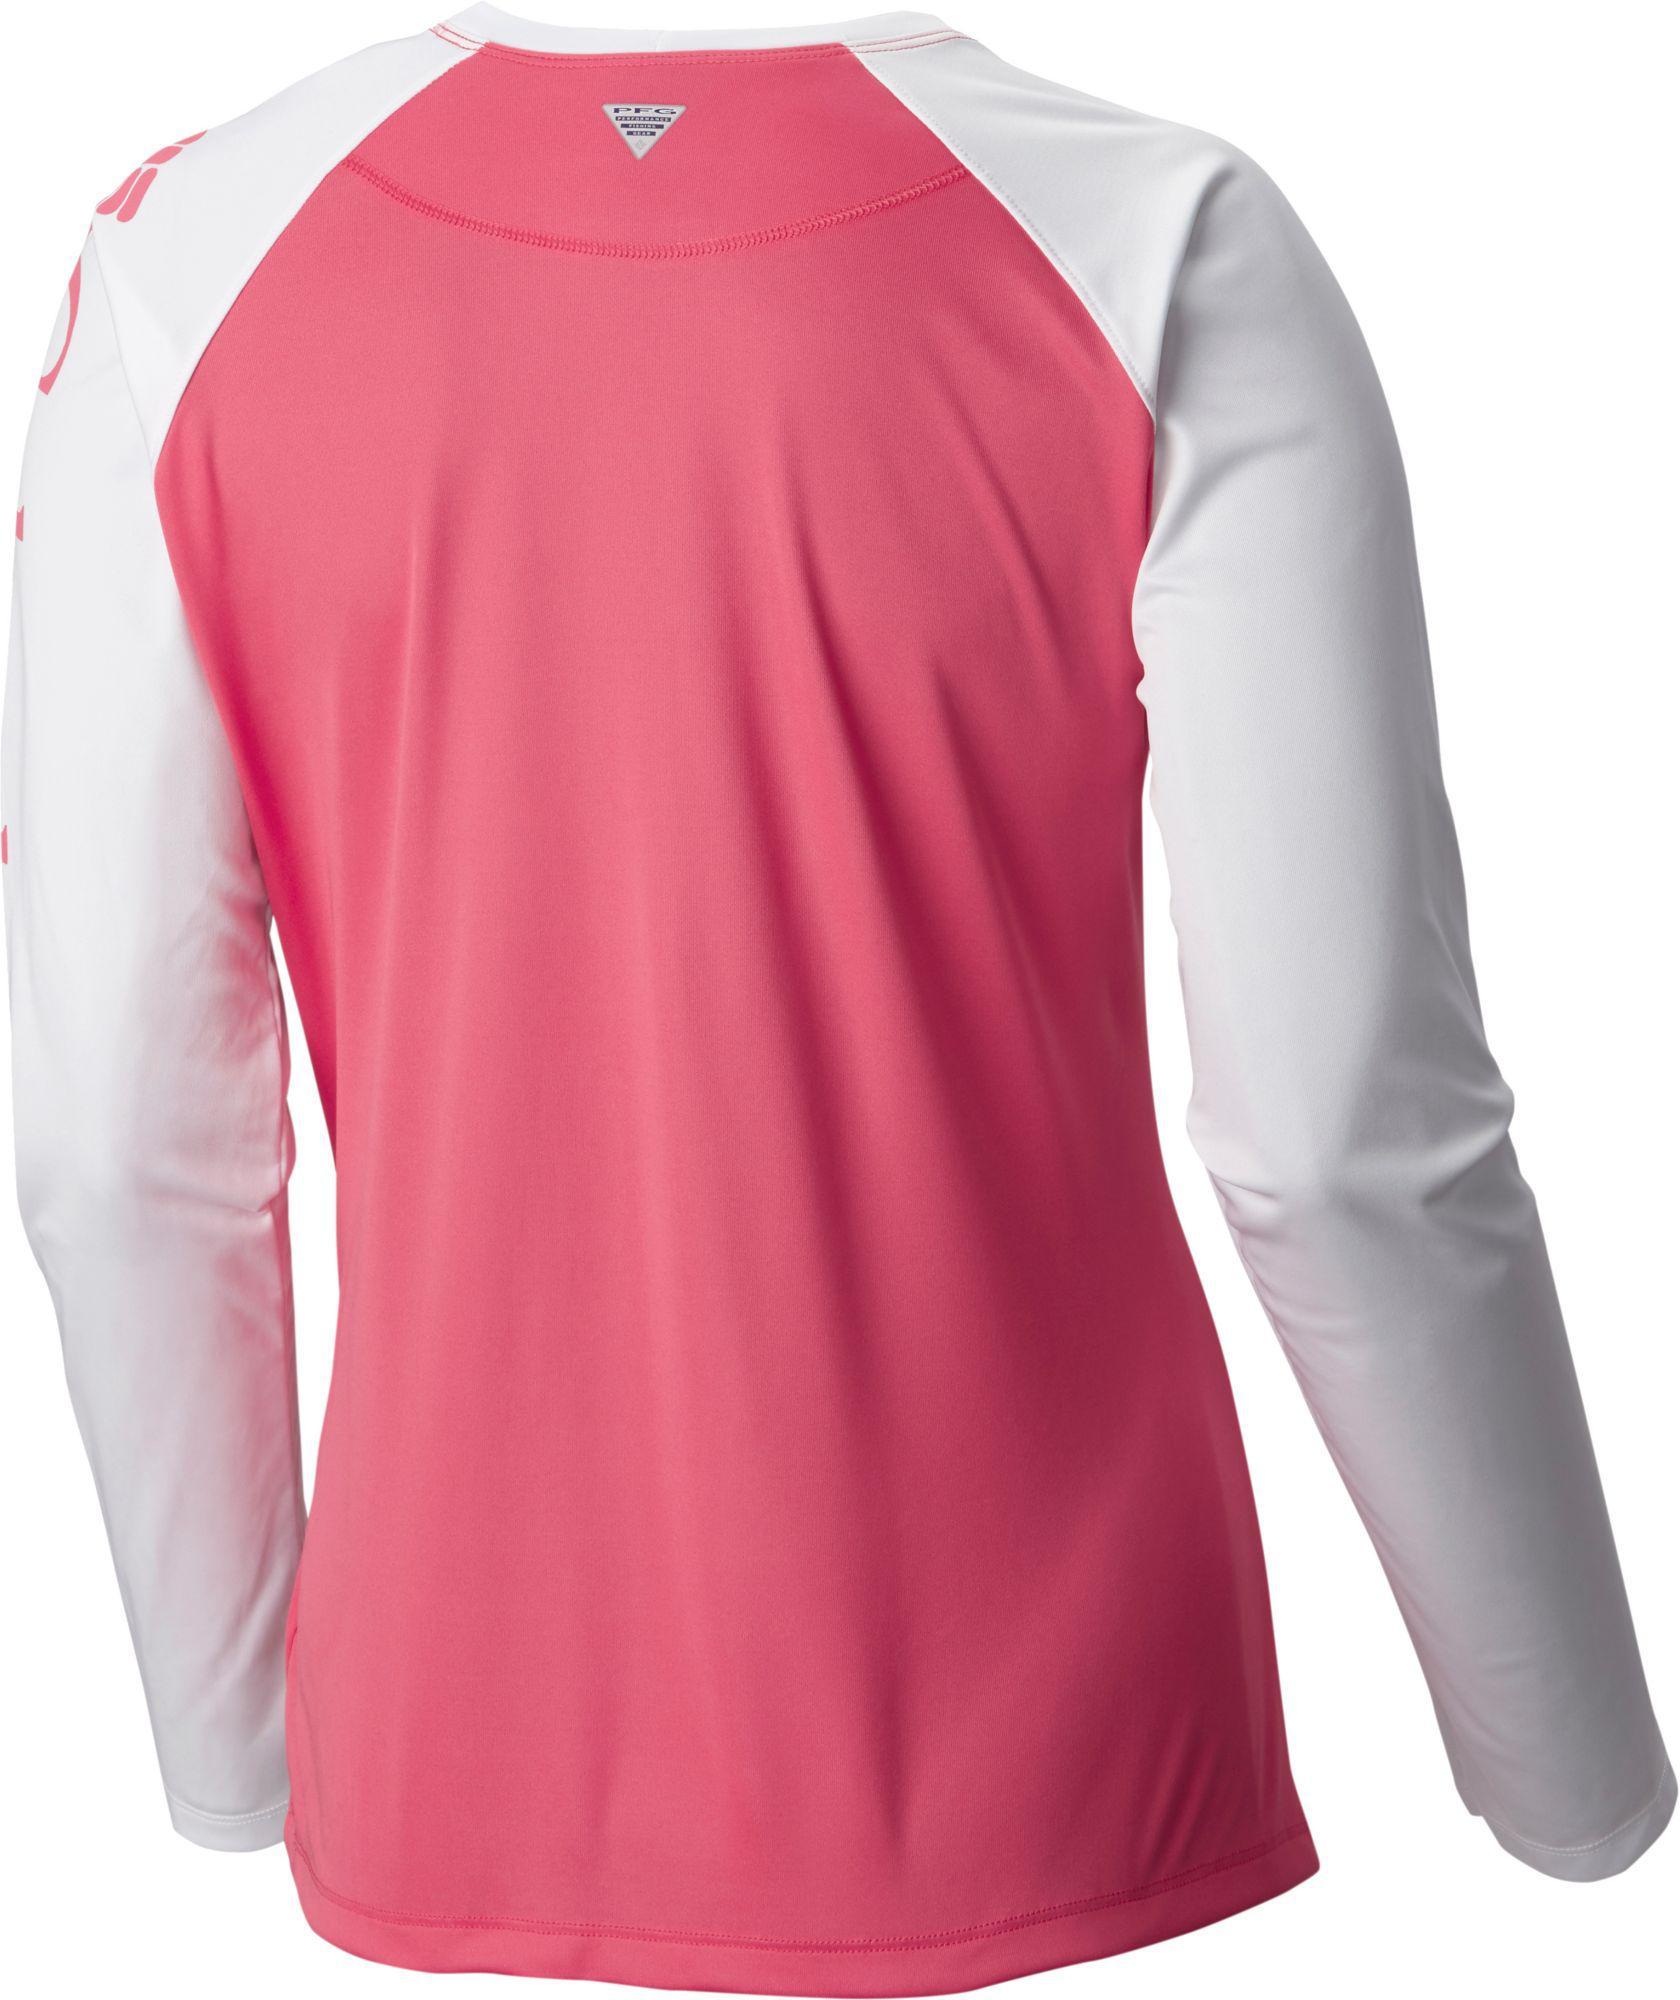 bb4622e8cbd Lyst - Columbia Pfg Tidal Tee Ii Long Sleeve Shirt in Pink